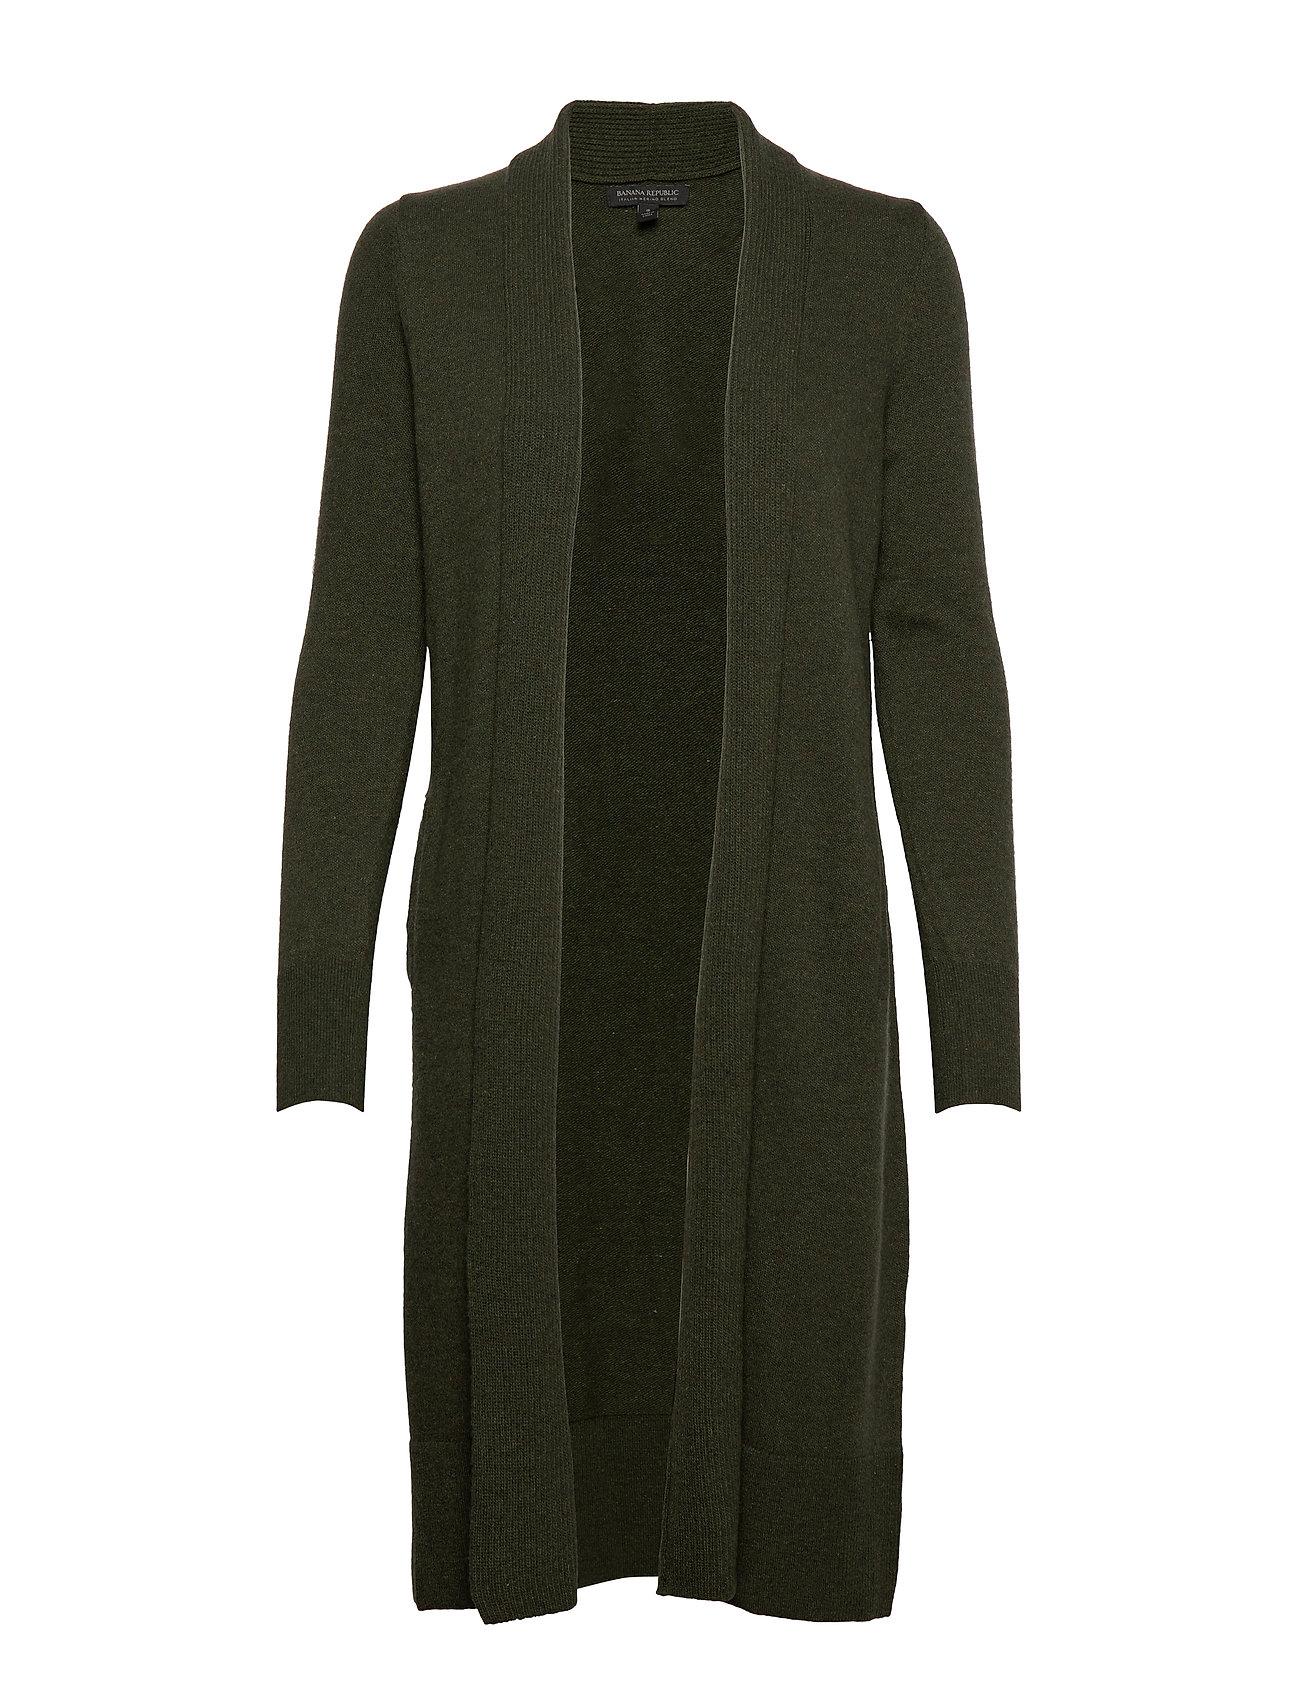 Banana Republic Italian Wool-Blend Duster Cardigan - FOREST GREEN 907